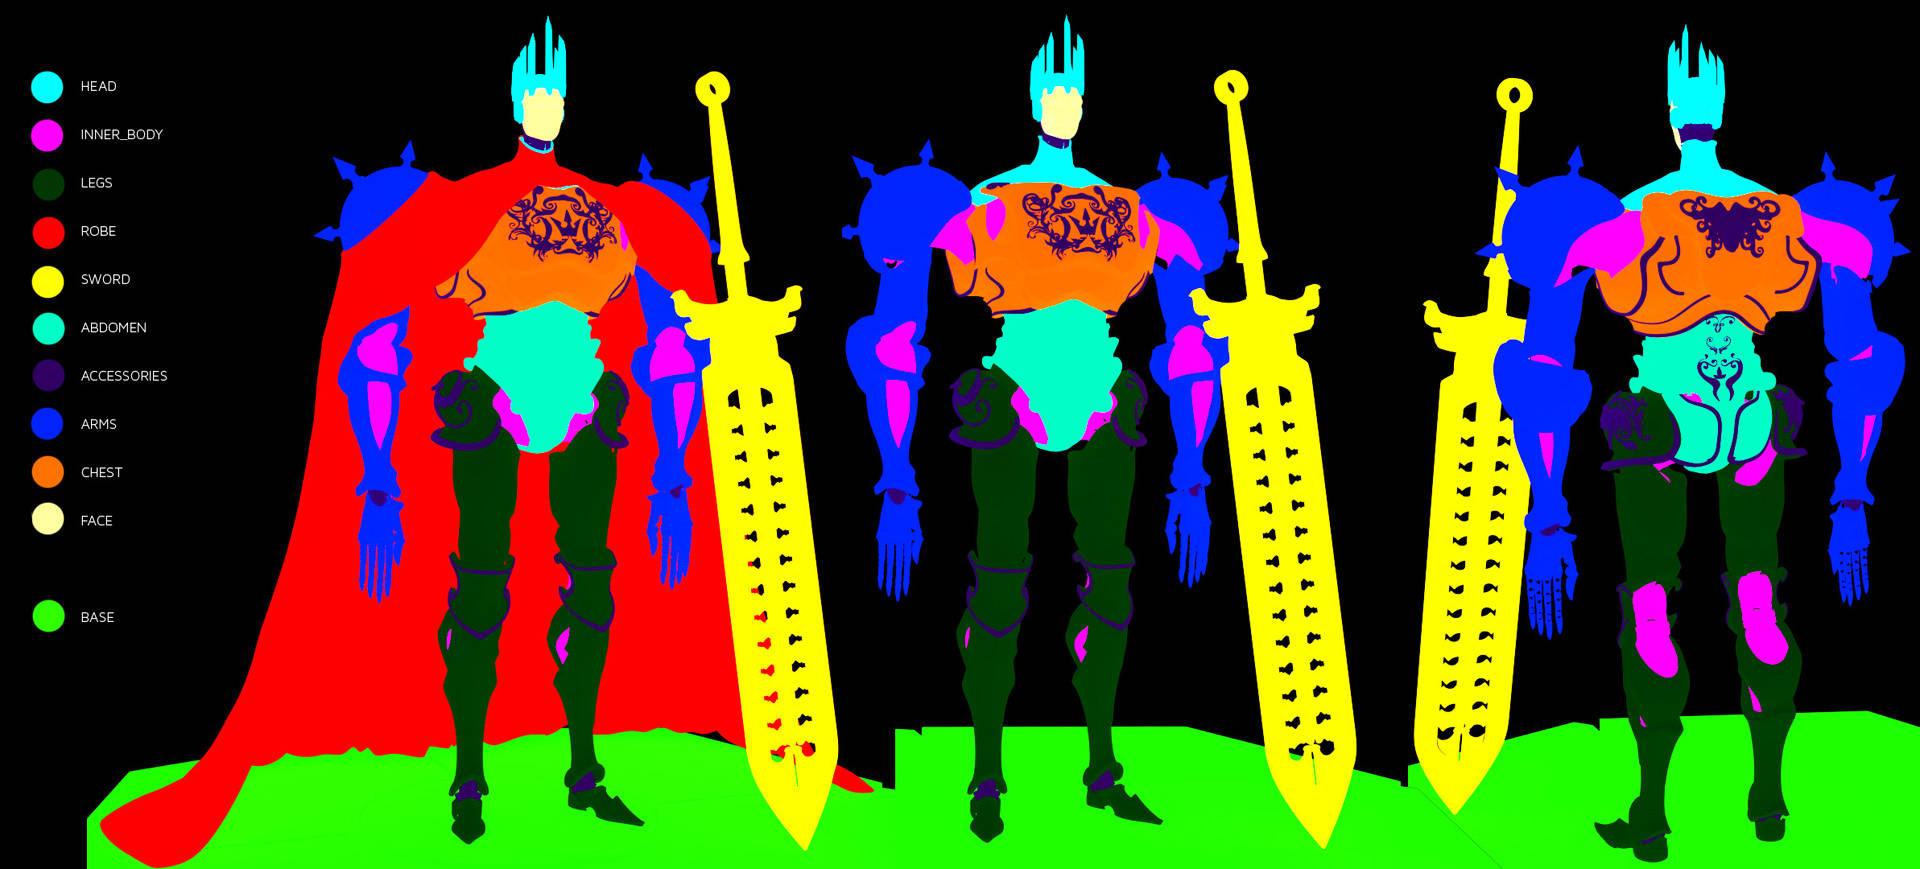 Color Code Robe.jpg